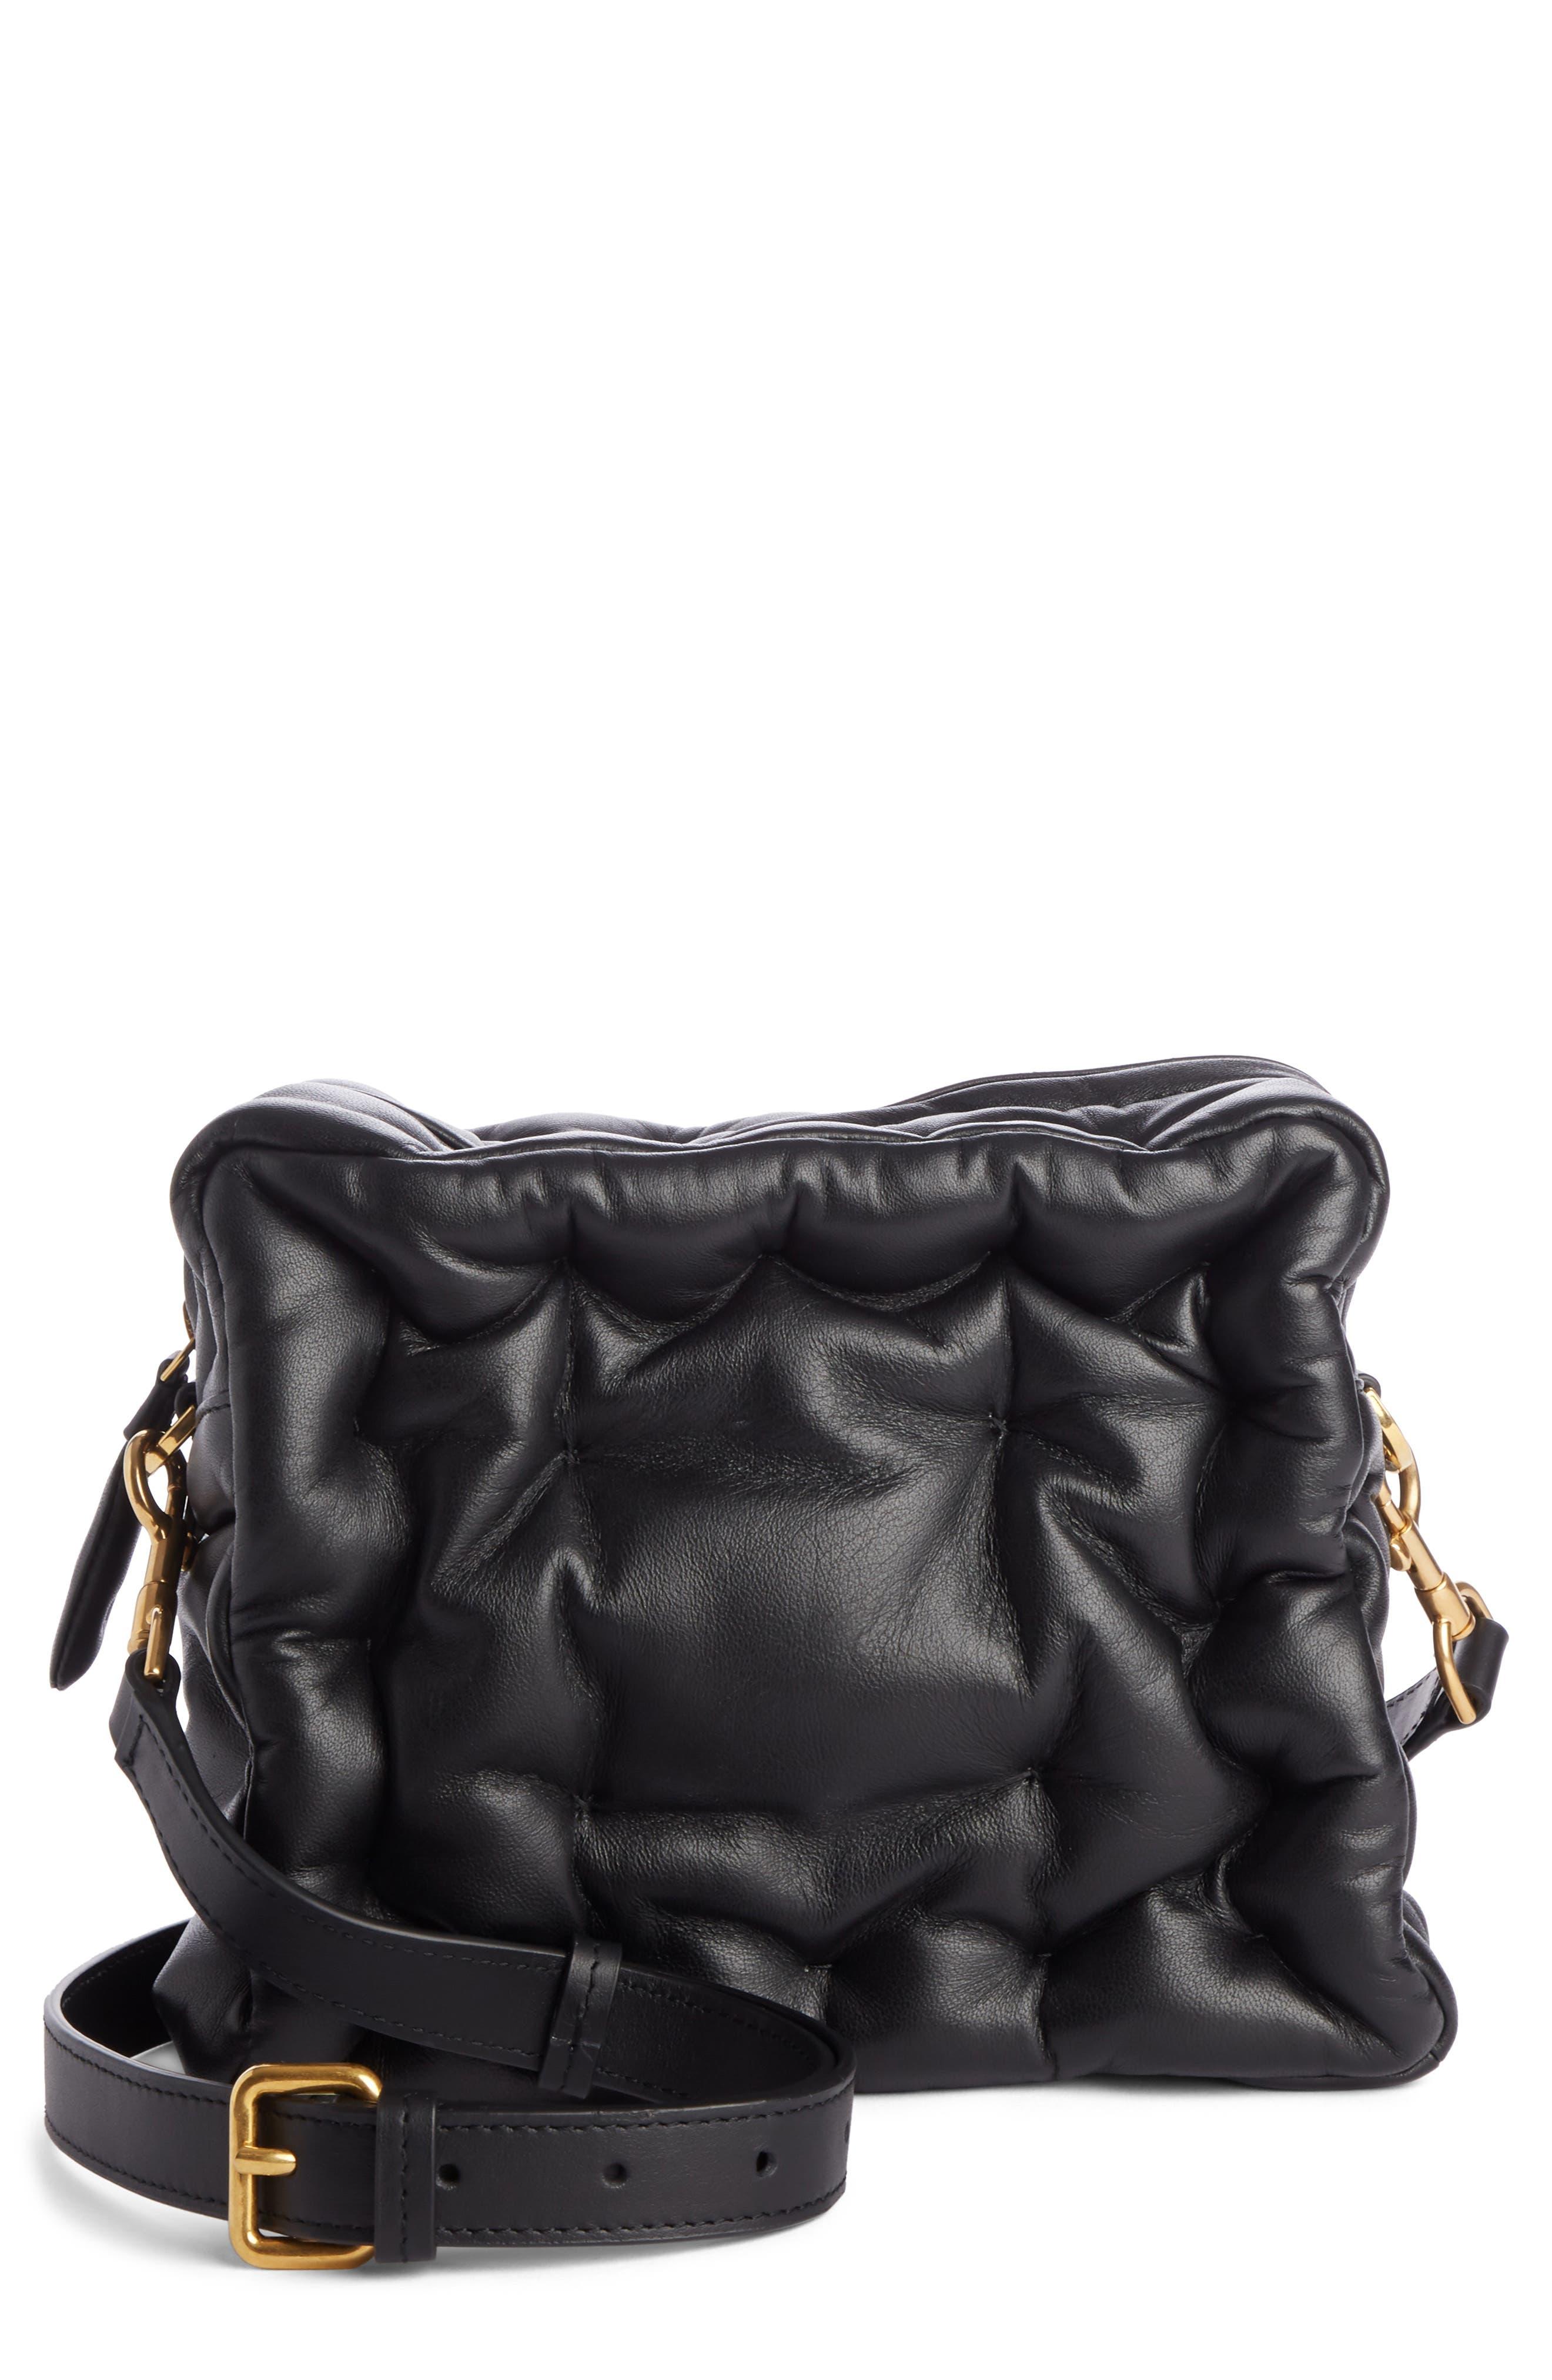 Chubby Cube Leather Crossbody Bag,                             Main thumbnail 1, color,                             BLACK